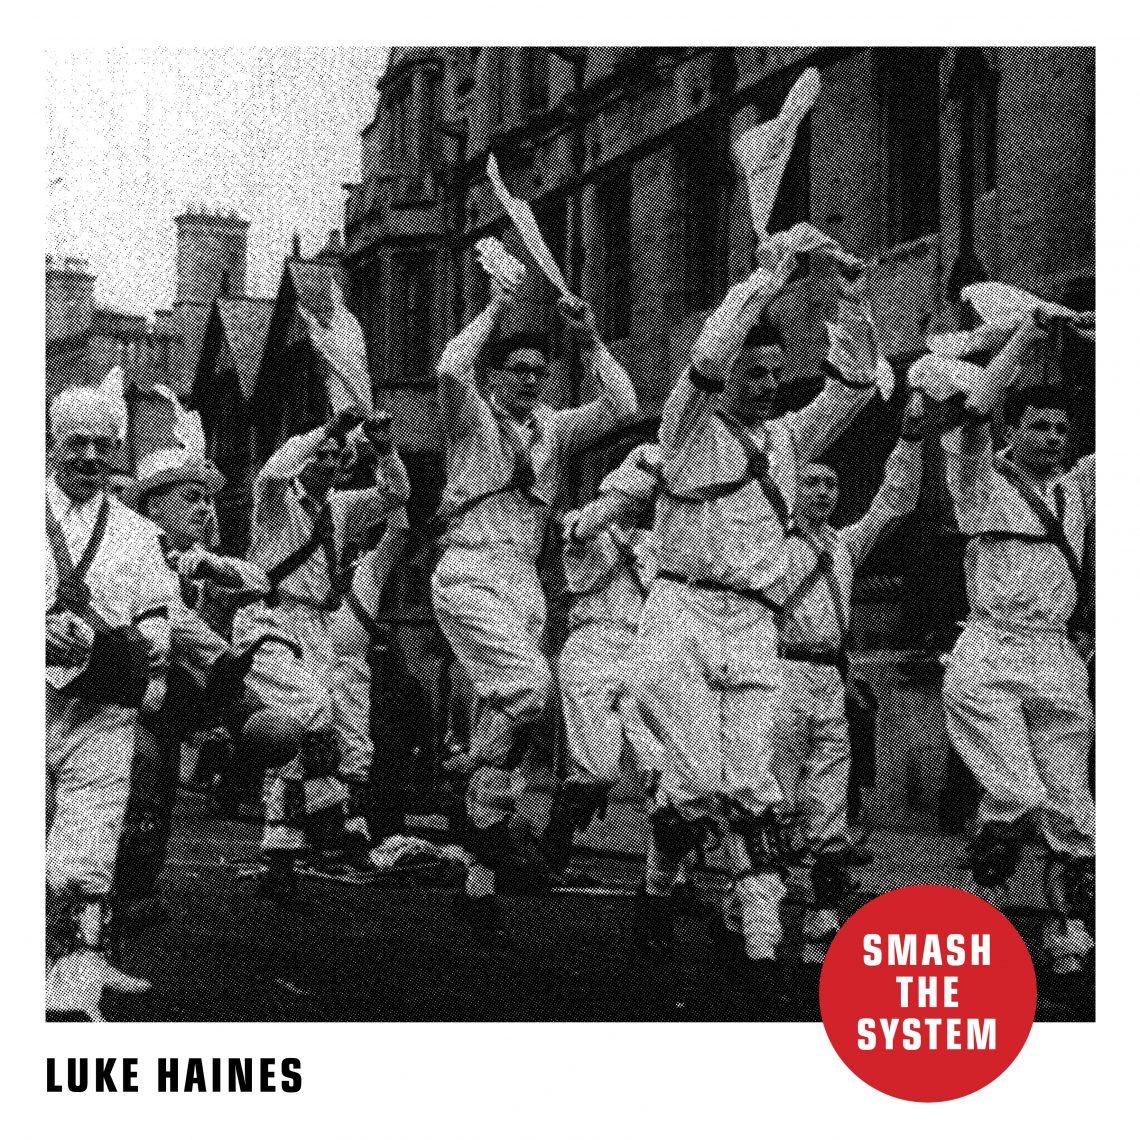 LUKE HAINES Smash The System